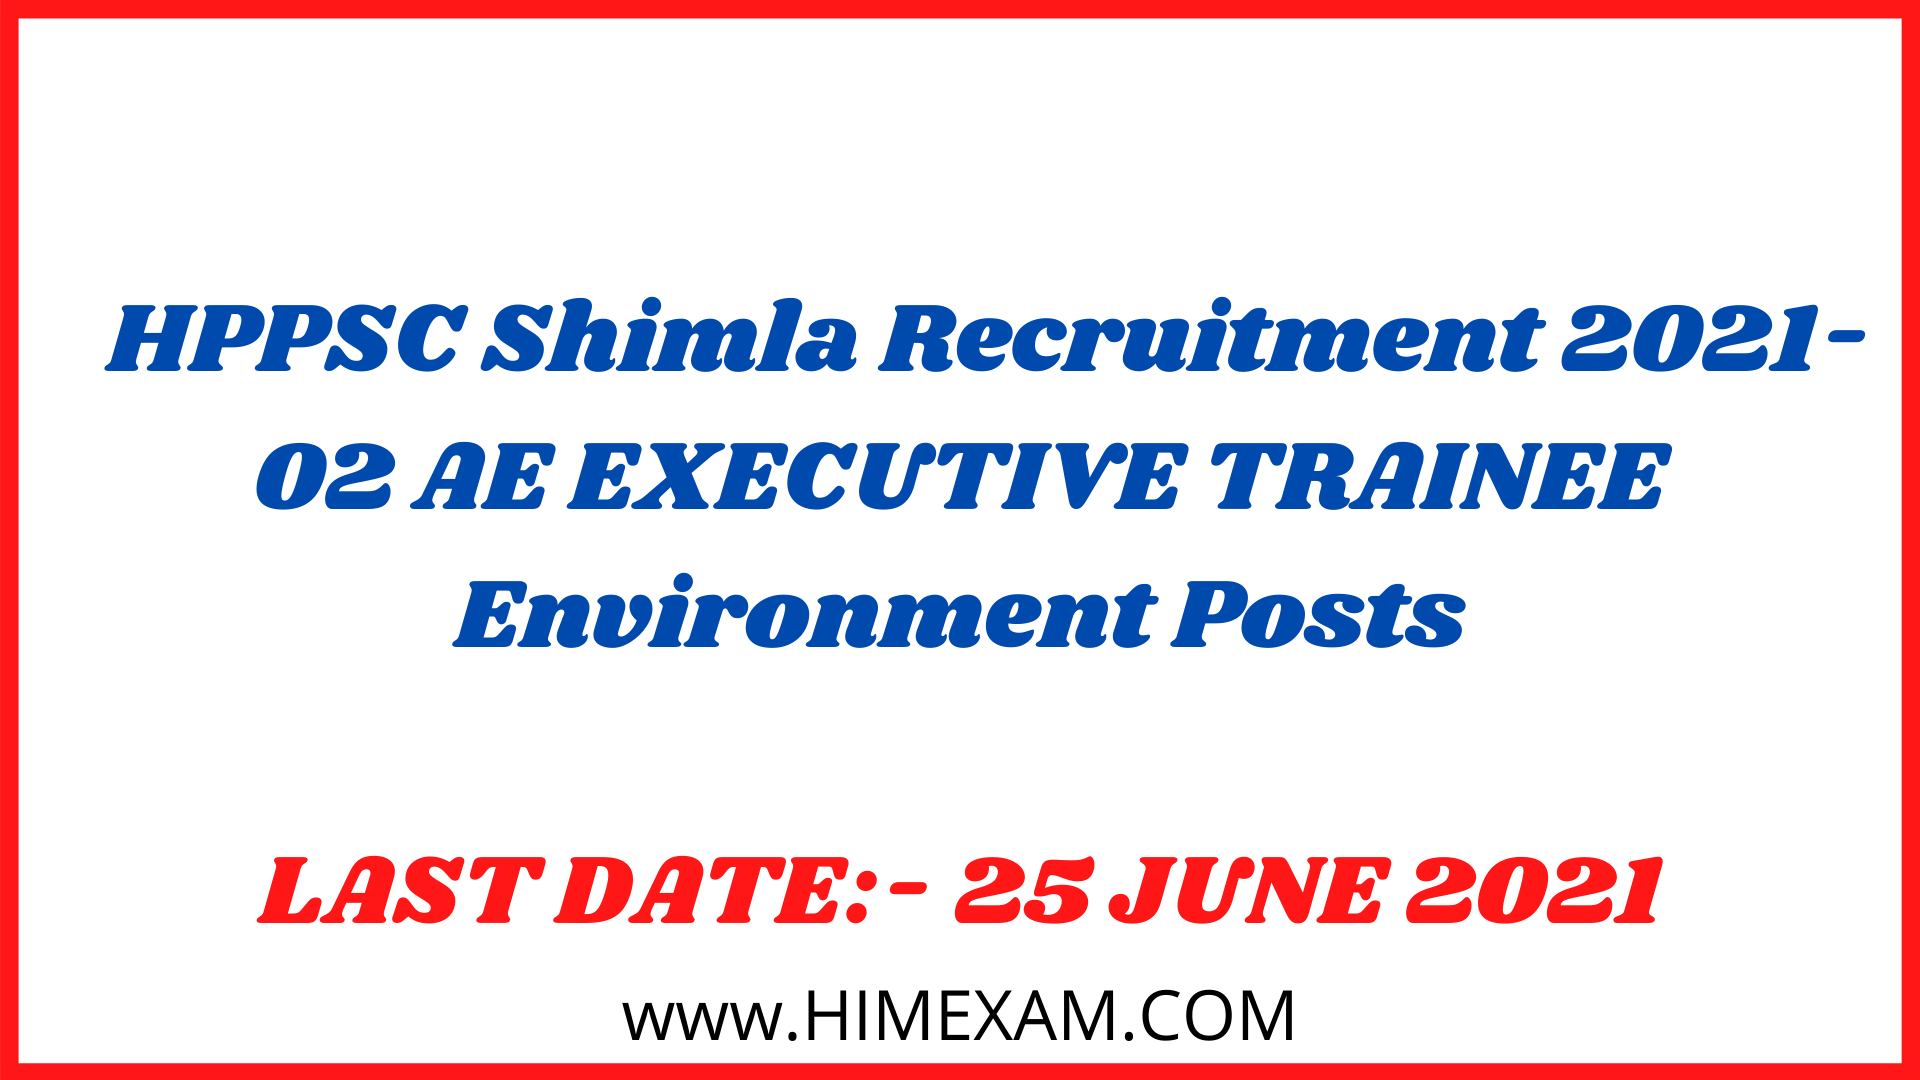 HPPSC Shimla Recruitment 2021-02 AE EXECUTIVE TRAINEE Environment Posts